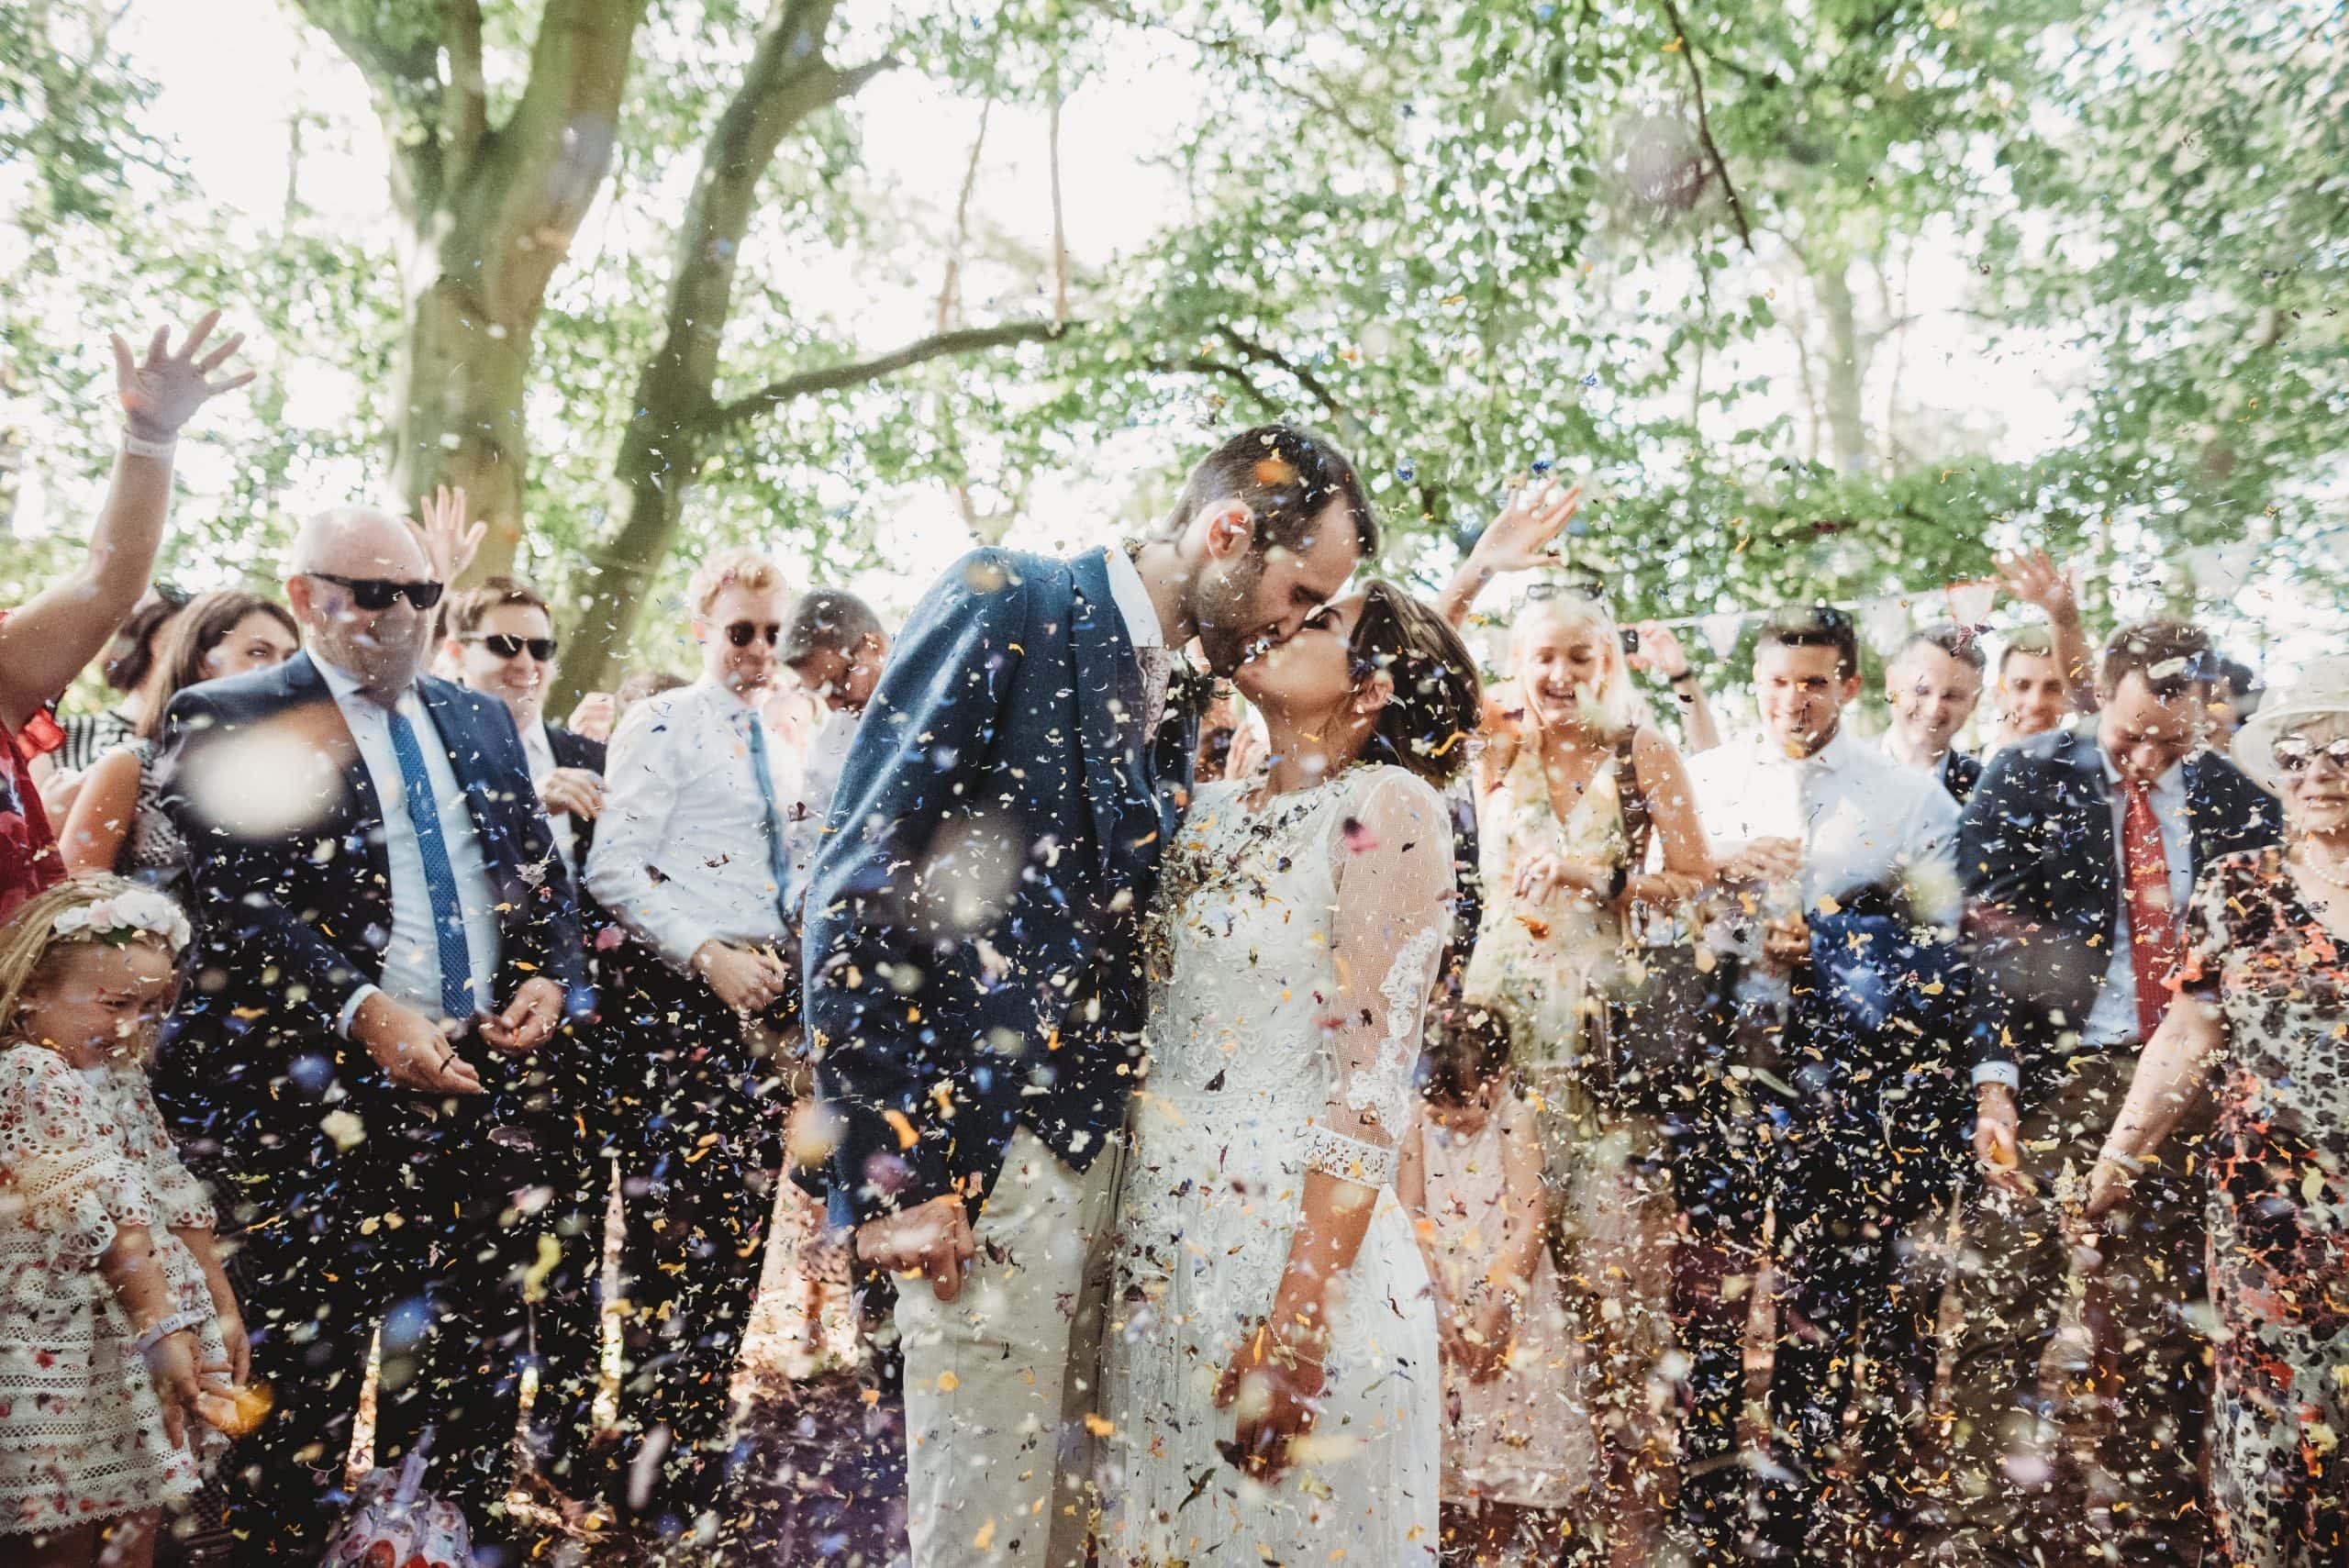 norfolk wedding planner uk